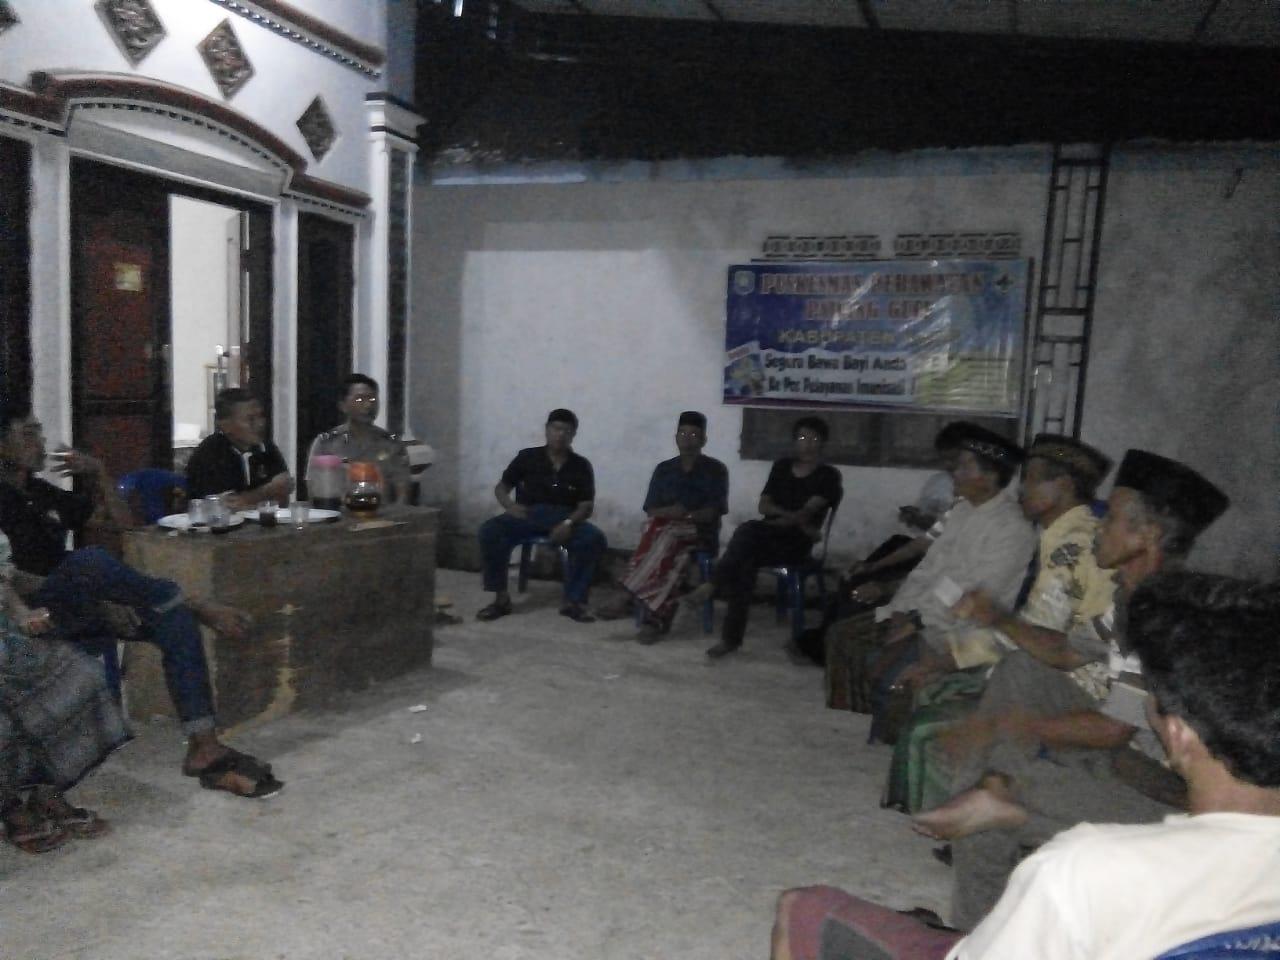 Ikut Musyawarah Desa, Polsek Kaur Utara Dukung Kegiatan Gotong Royong